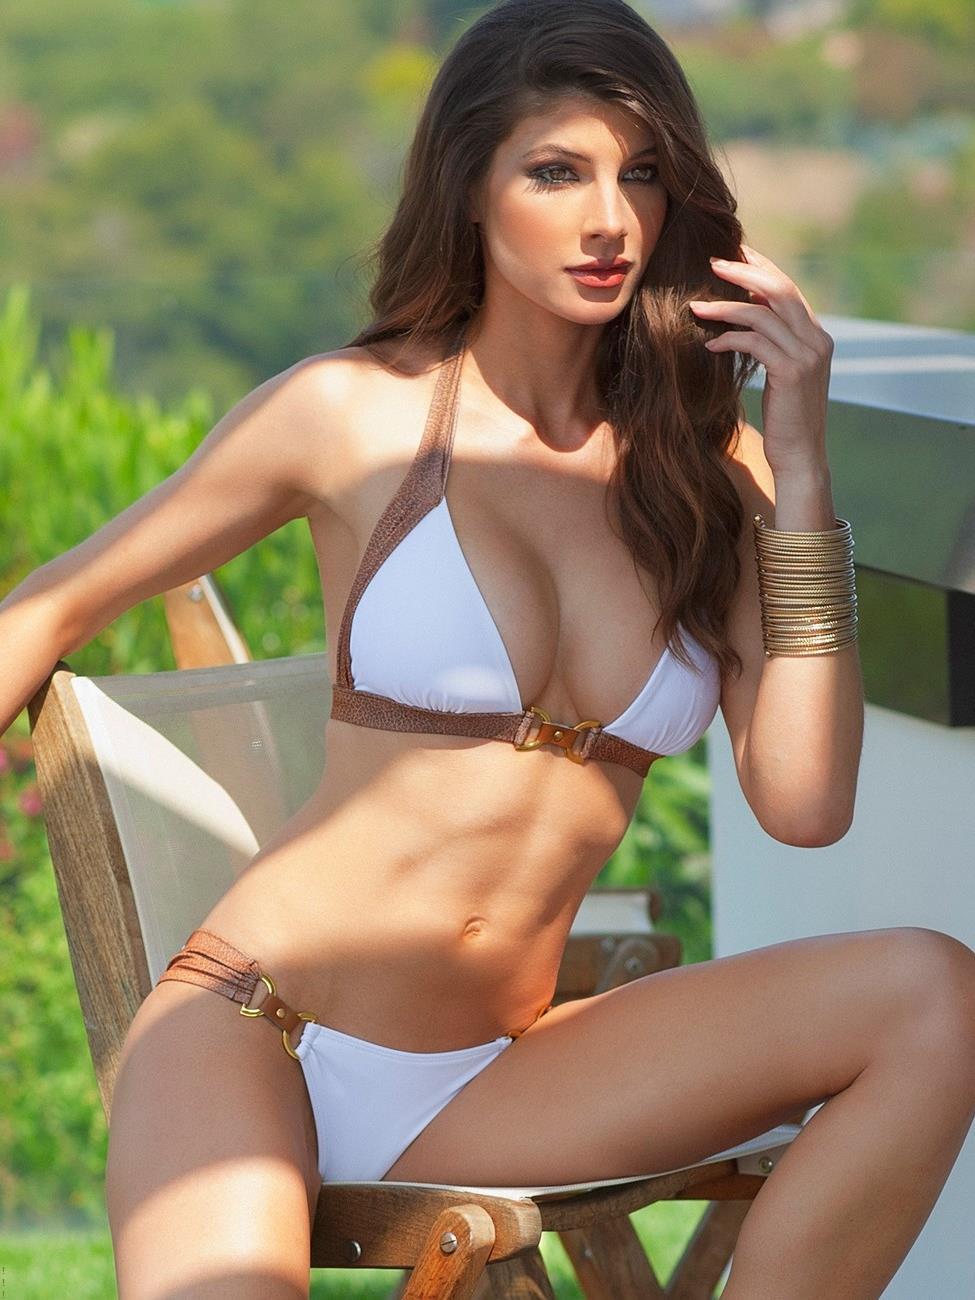 Cora Skinner in a bikini